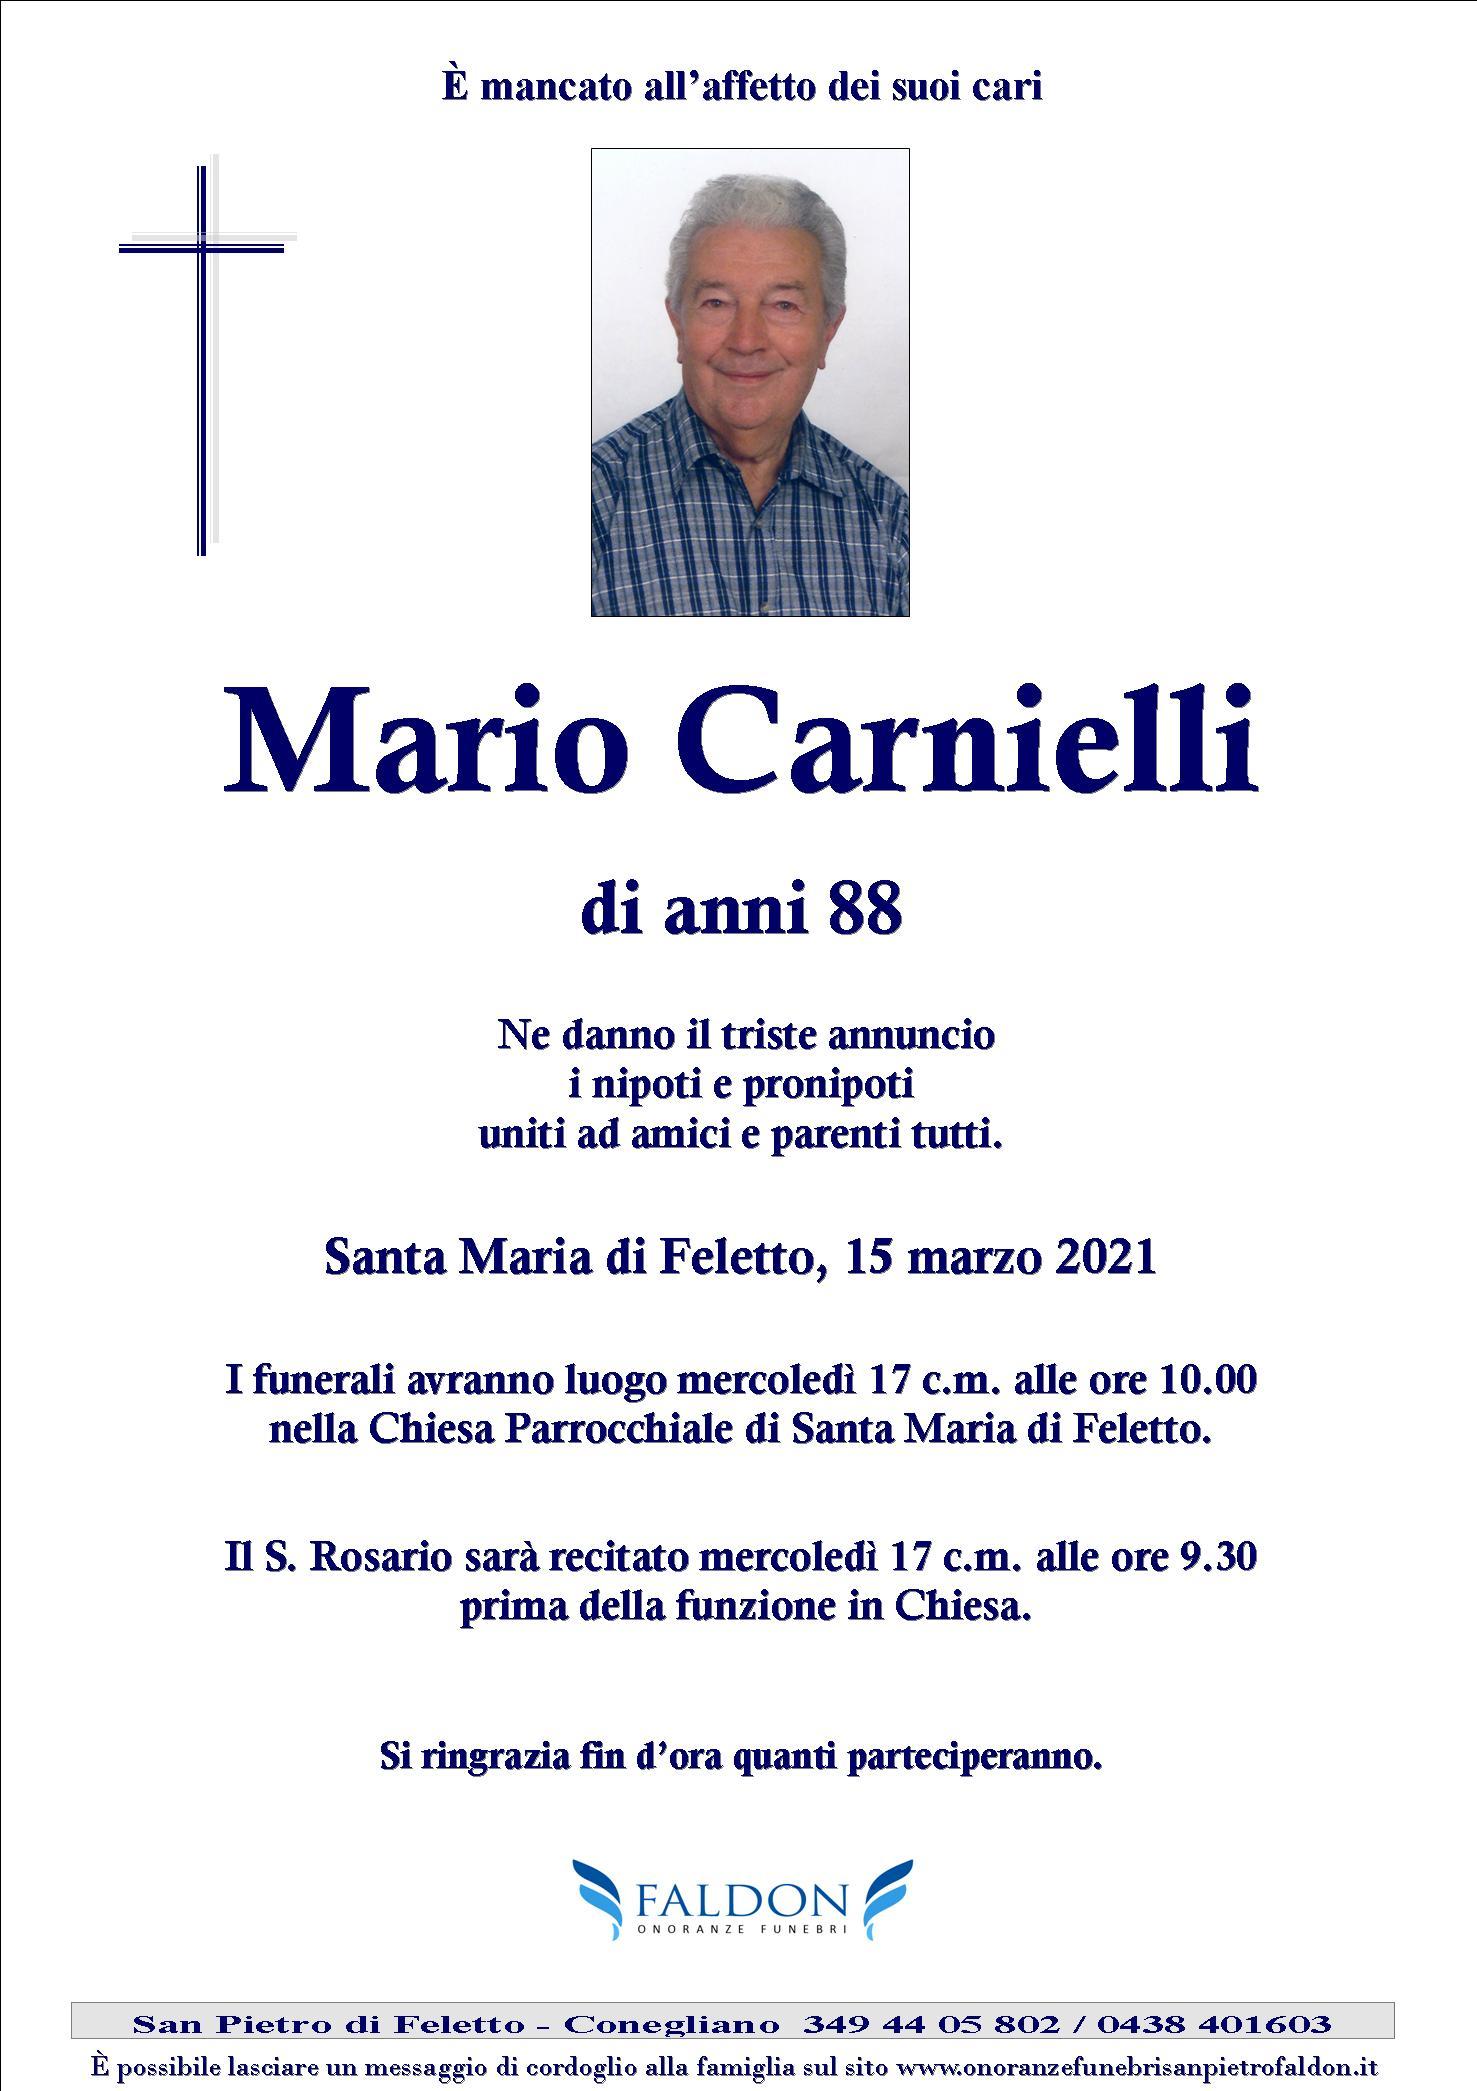 Mario Carnielli